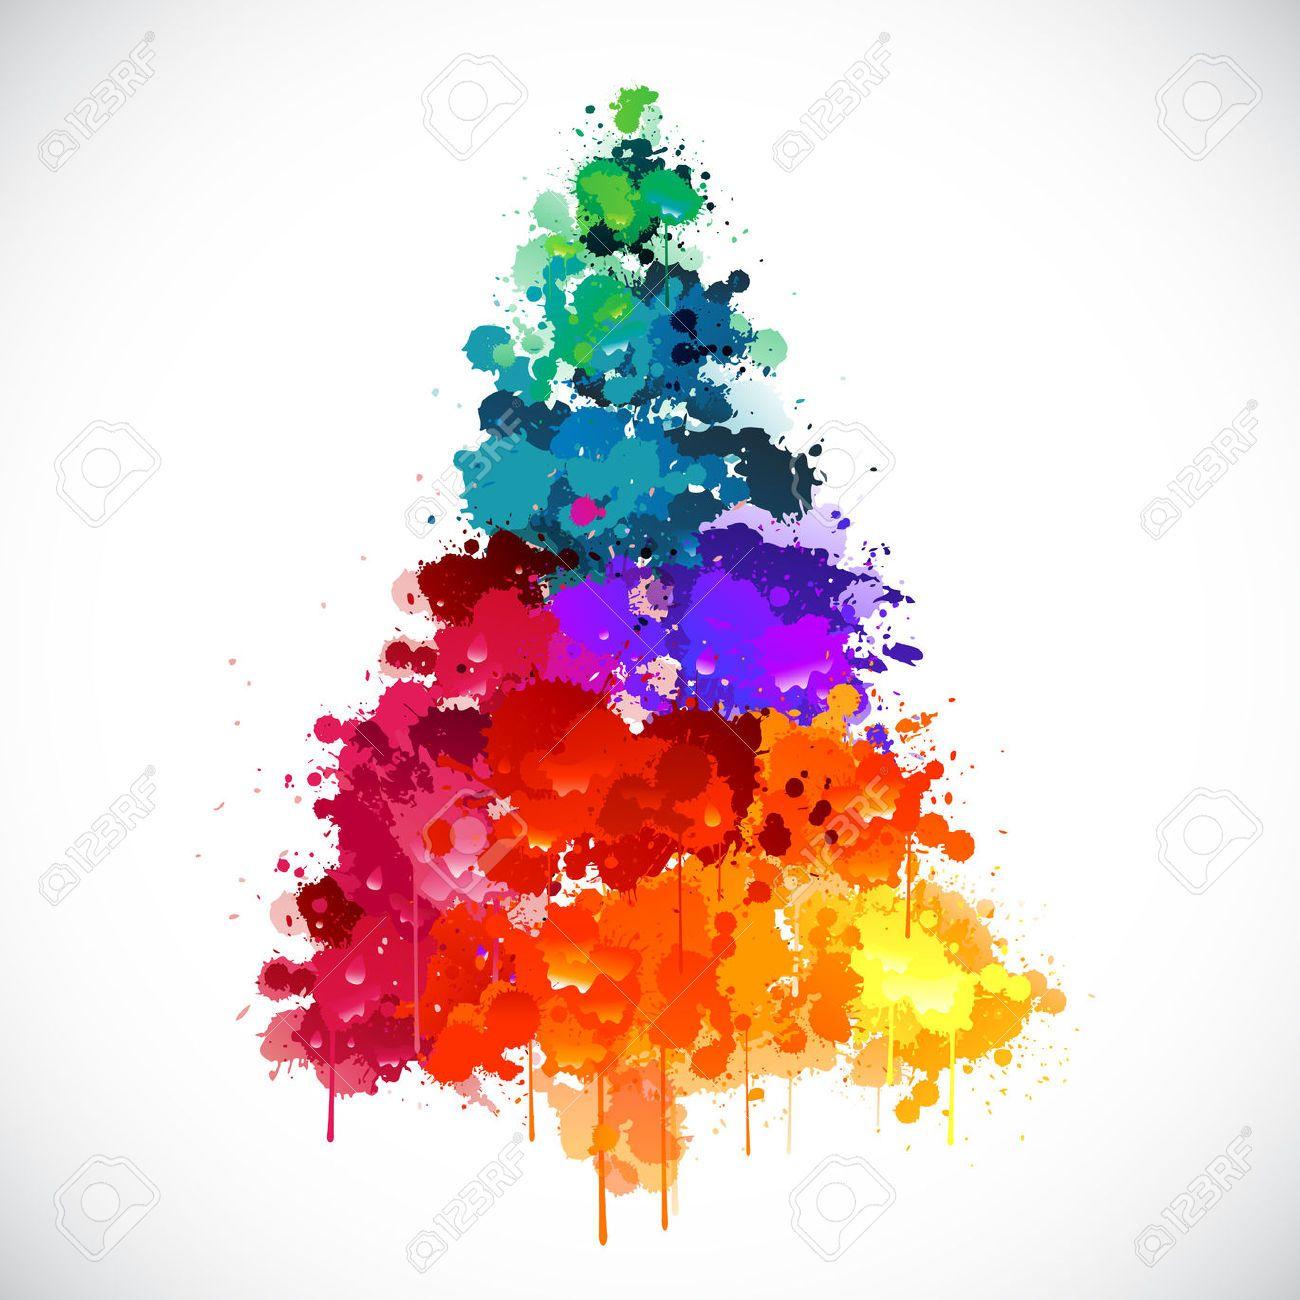 Colorful abstract paint splash Christmas tree | Christmas trees ...